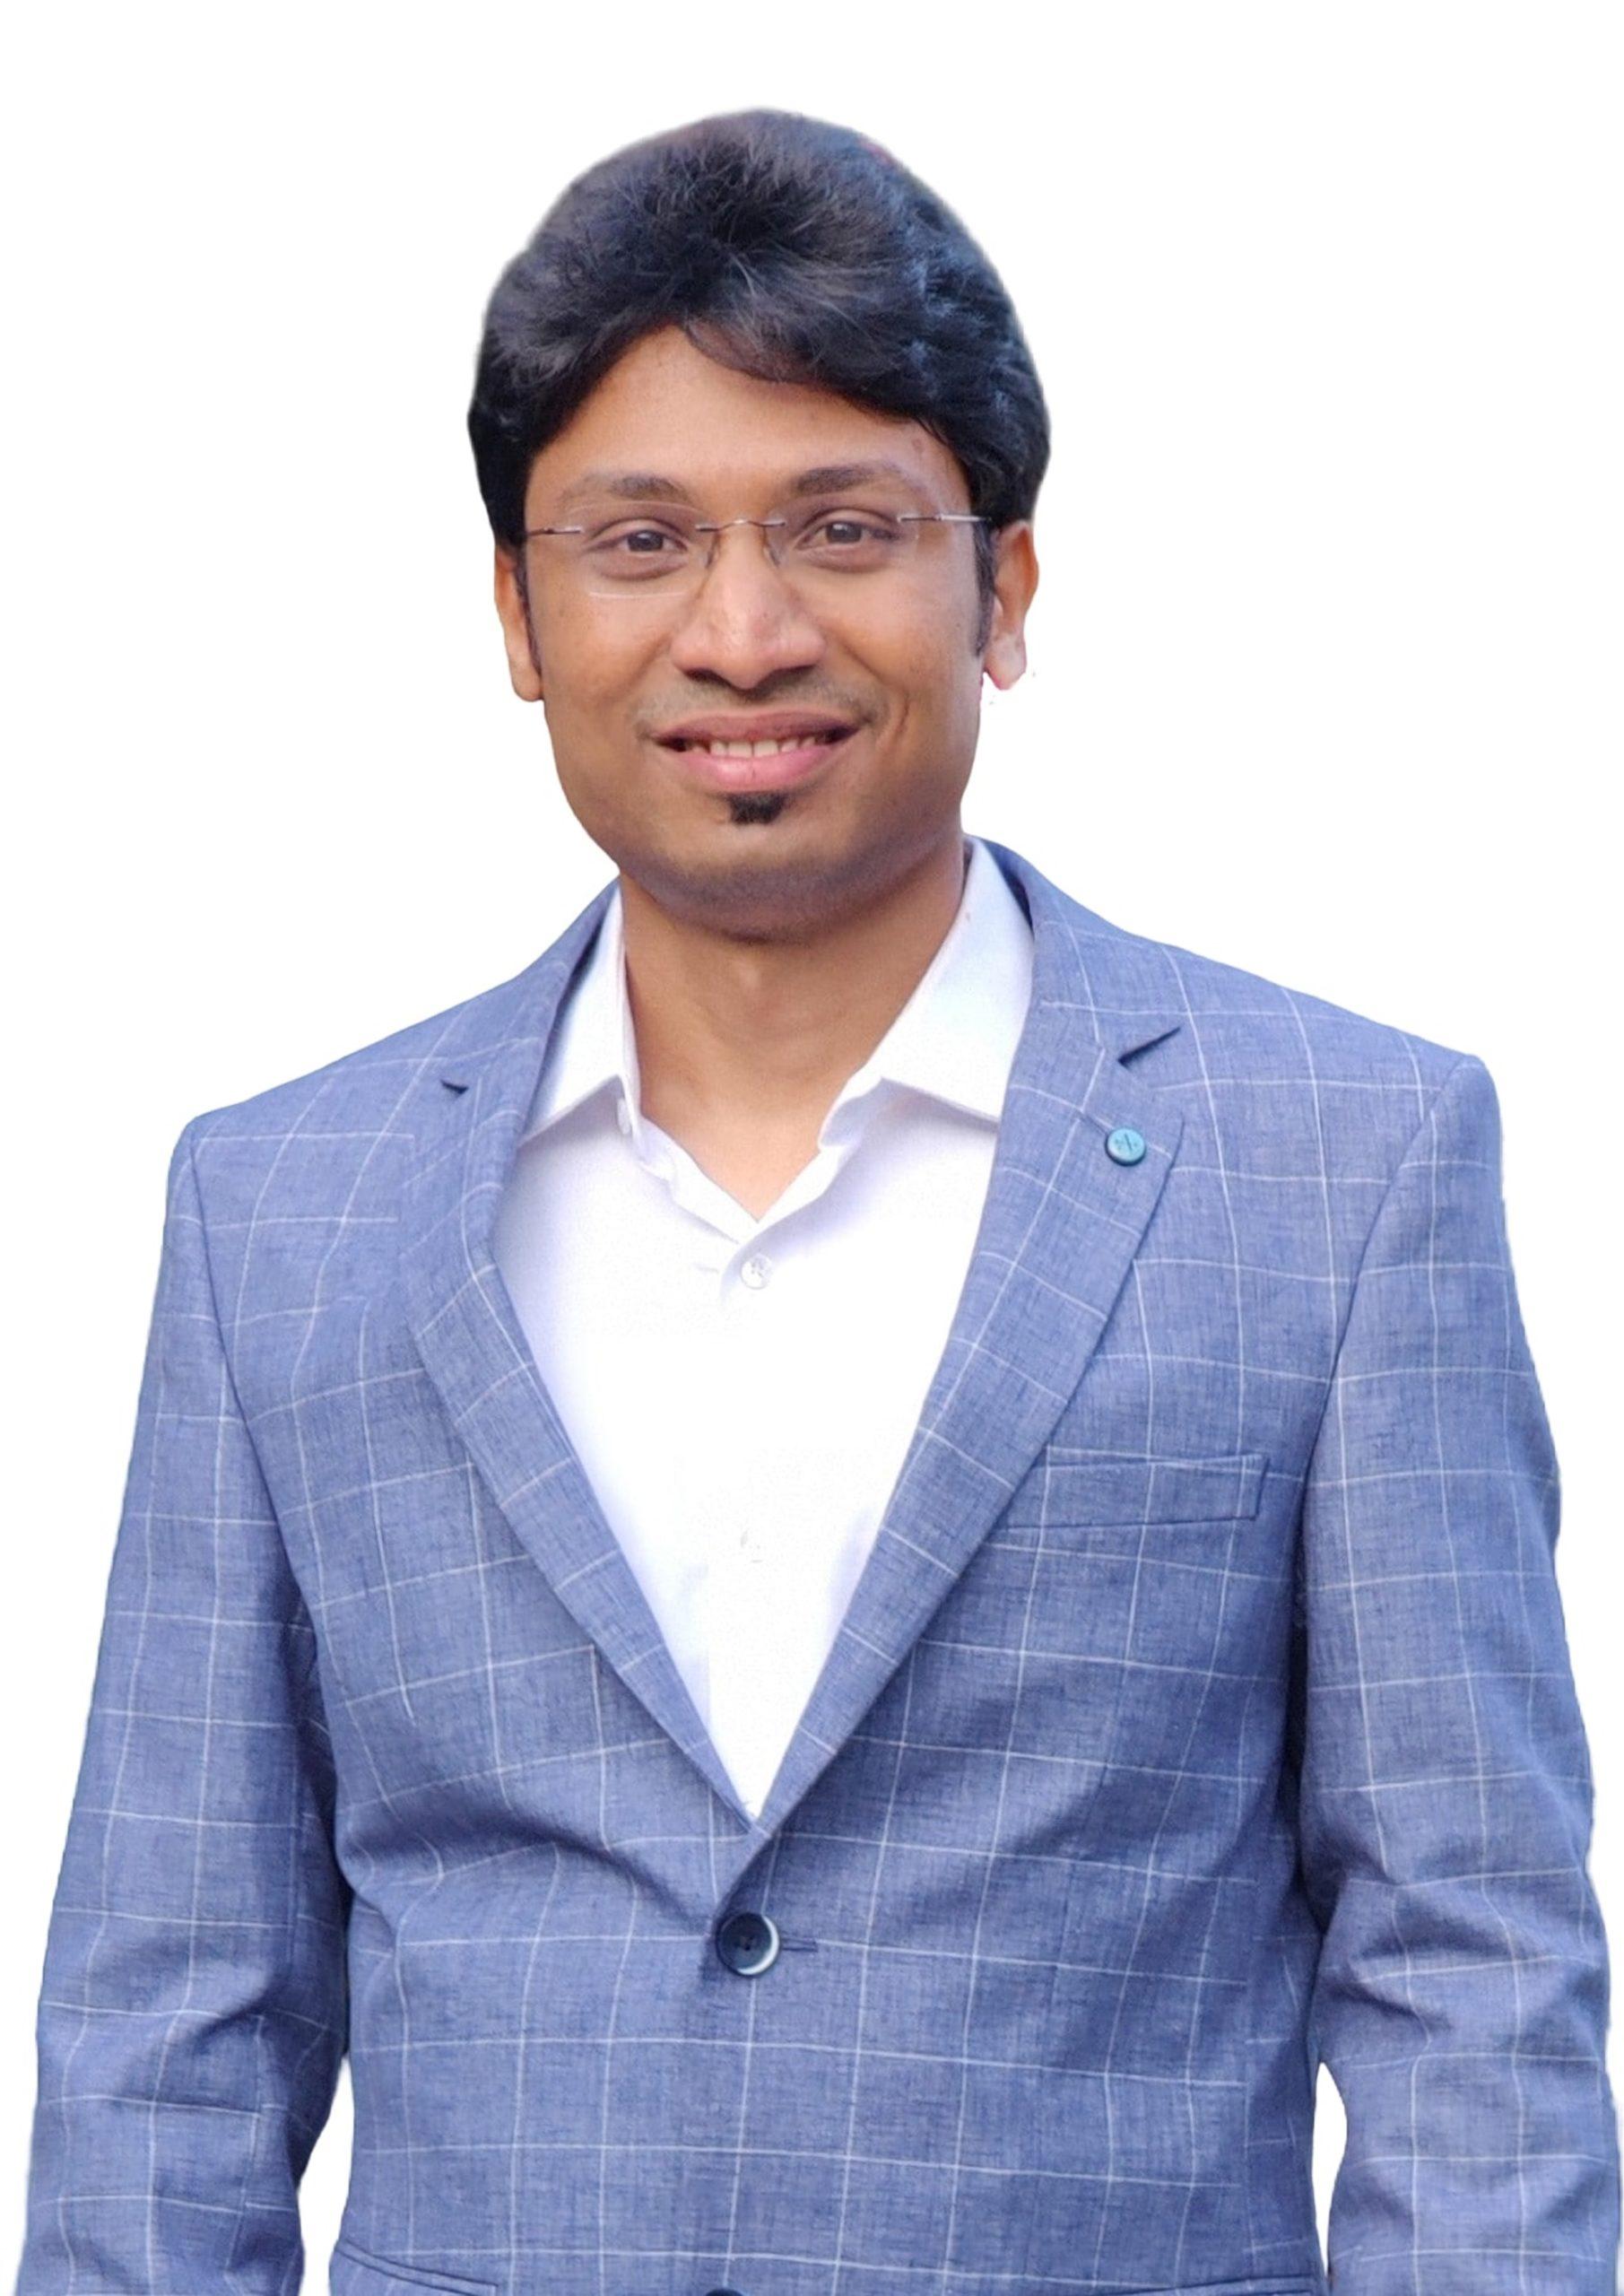 Pratik Bhivagaje, Partnership and Marketing manager, ShortsTV